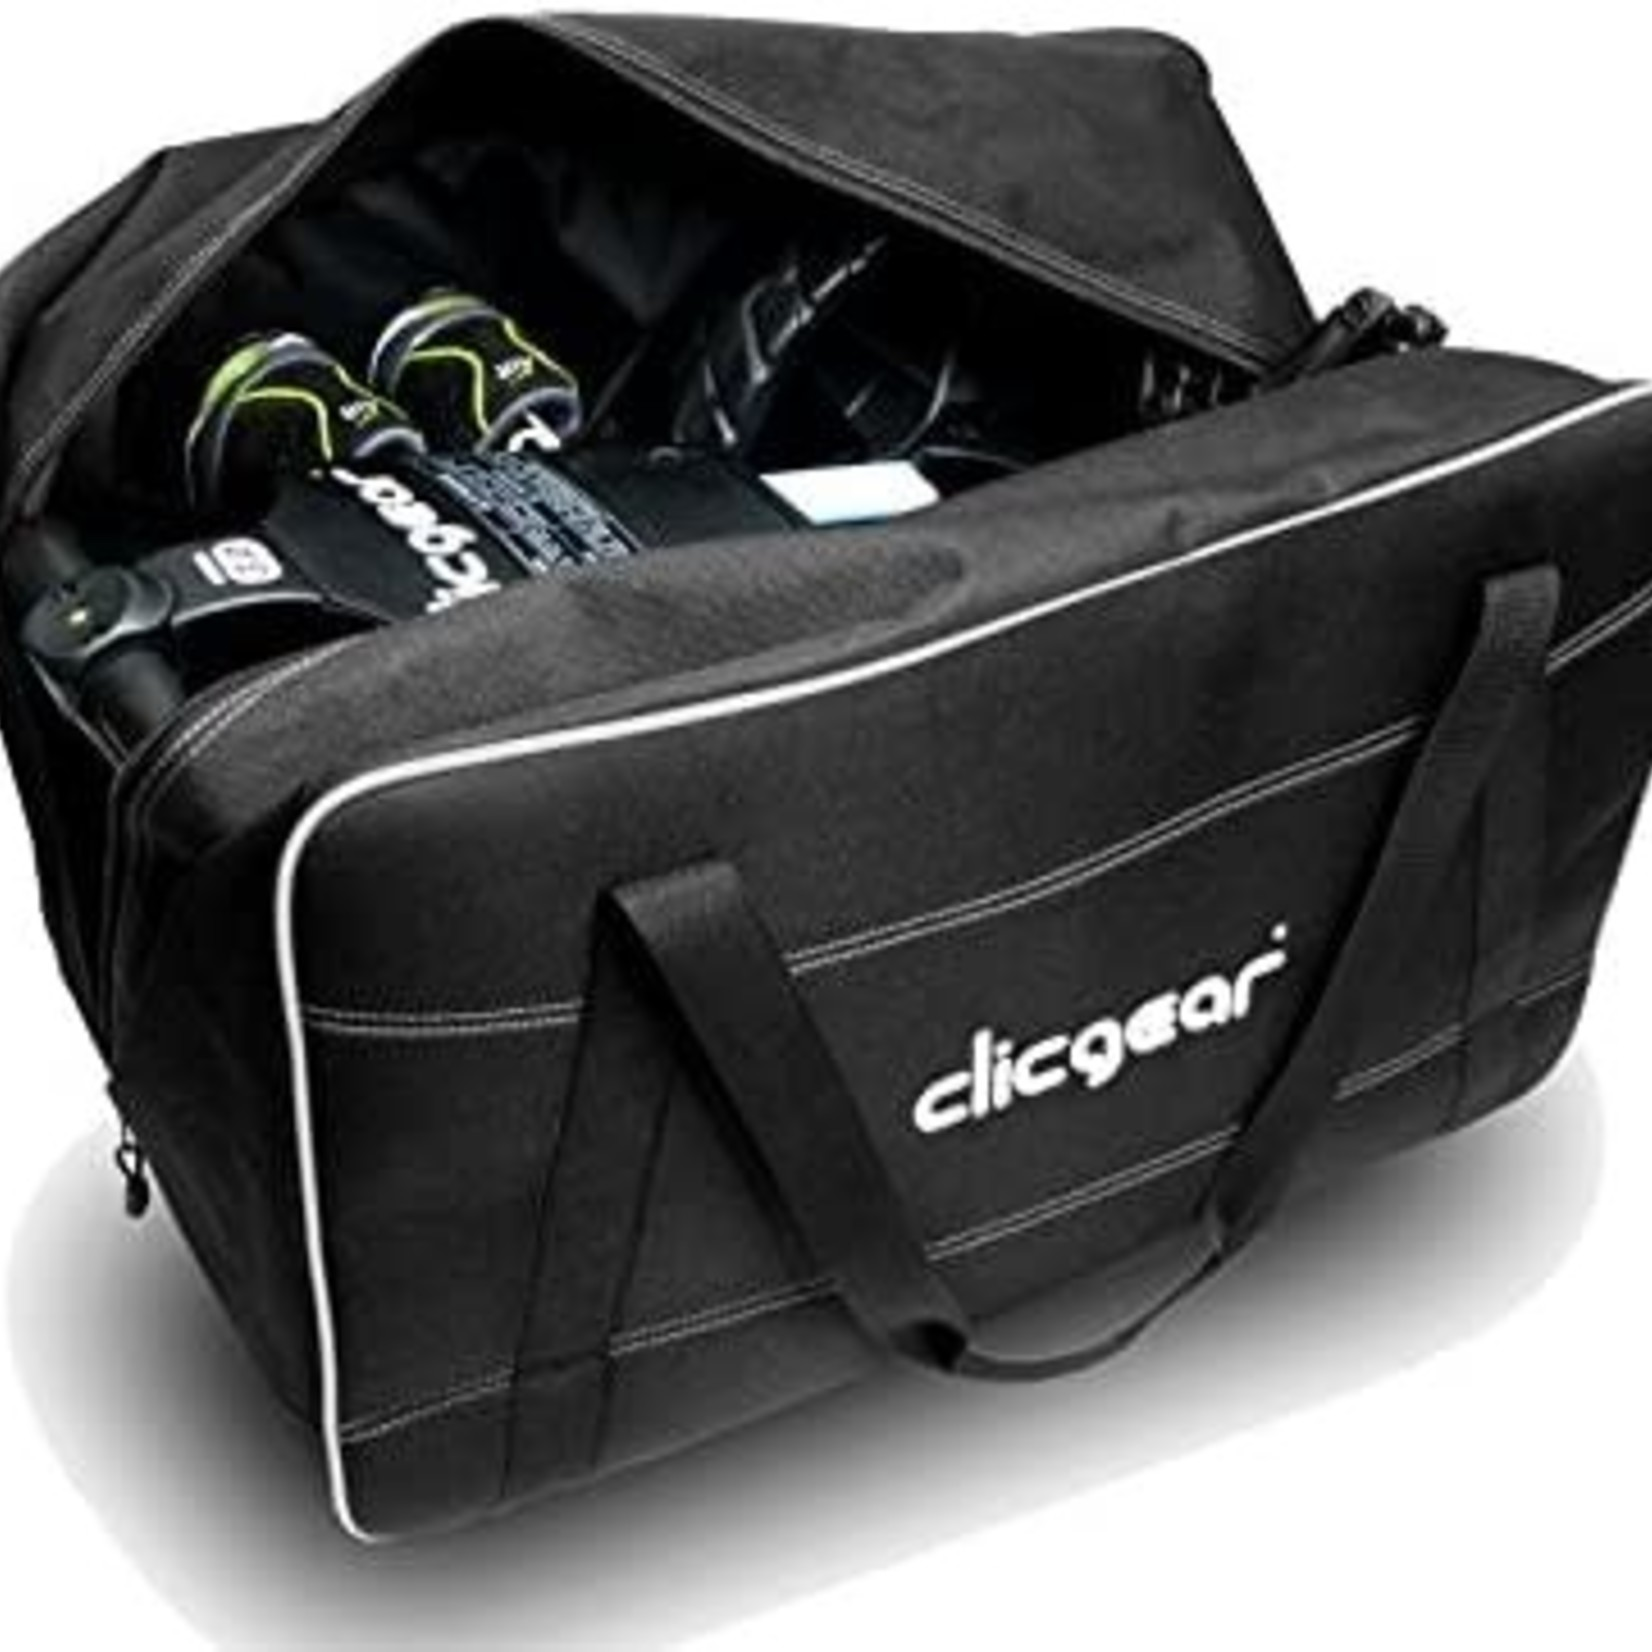 Clicgear Clicgear 3.5 Accessories